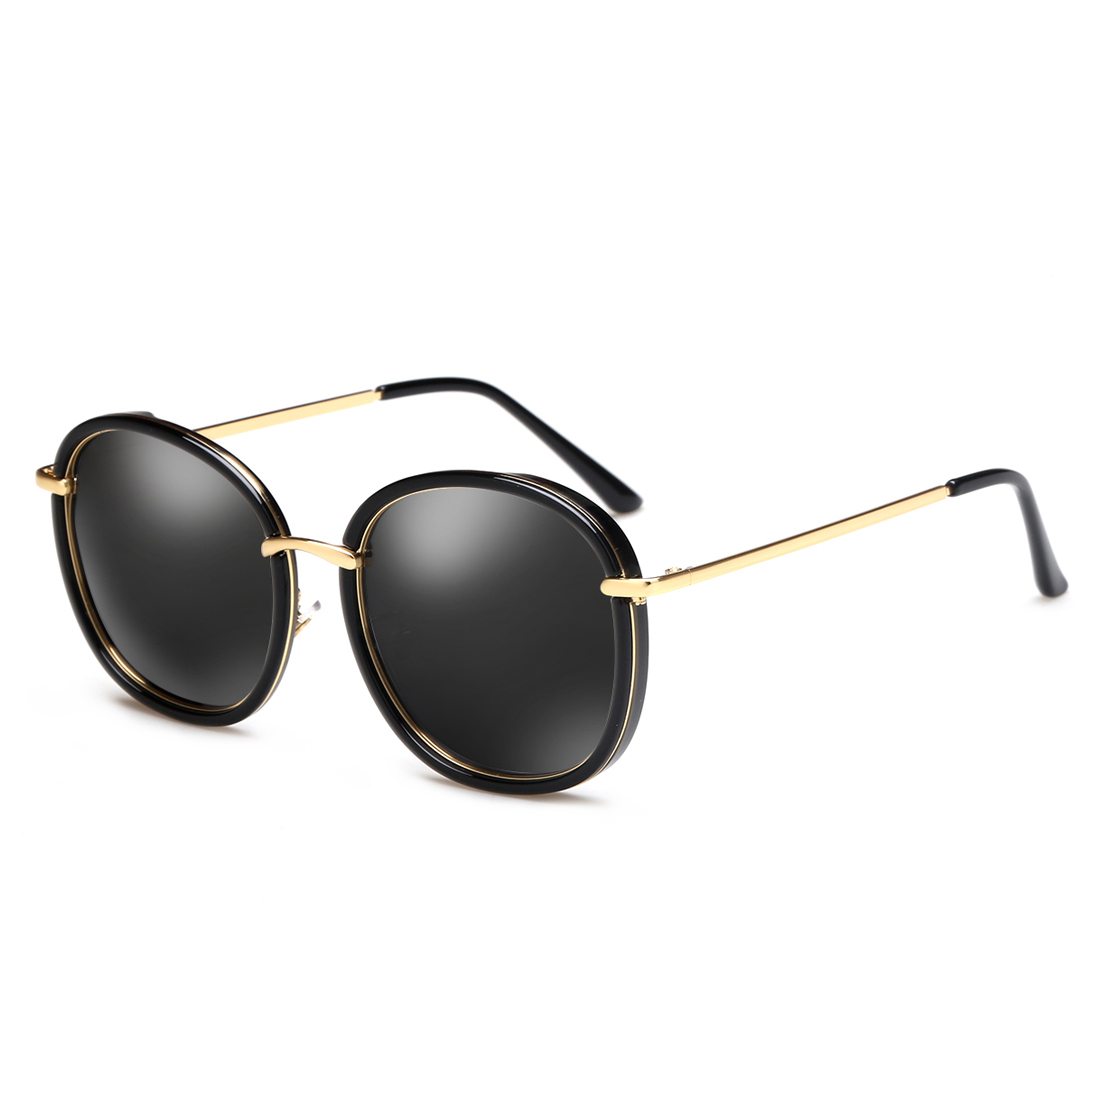 Kính nữ Oversize Sunglasses Mirrored Awesa